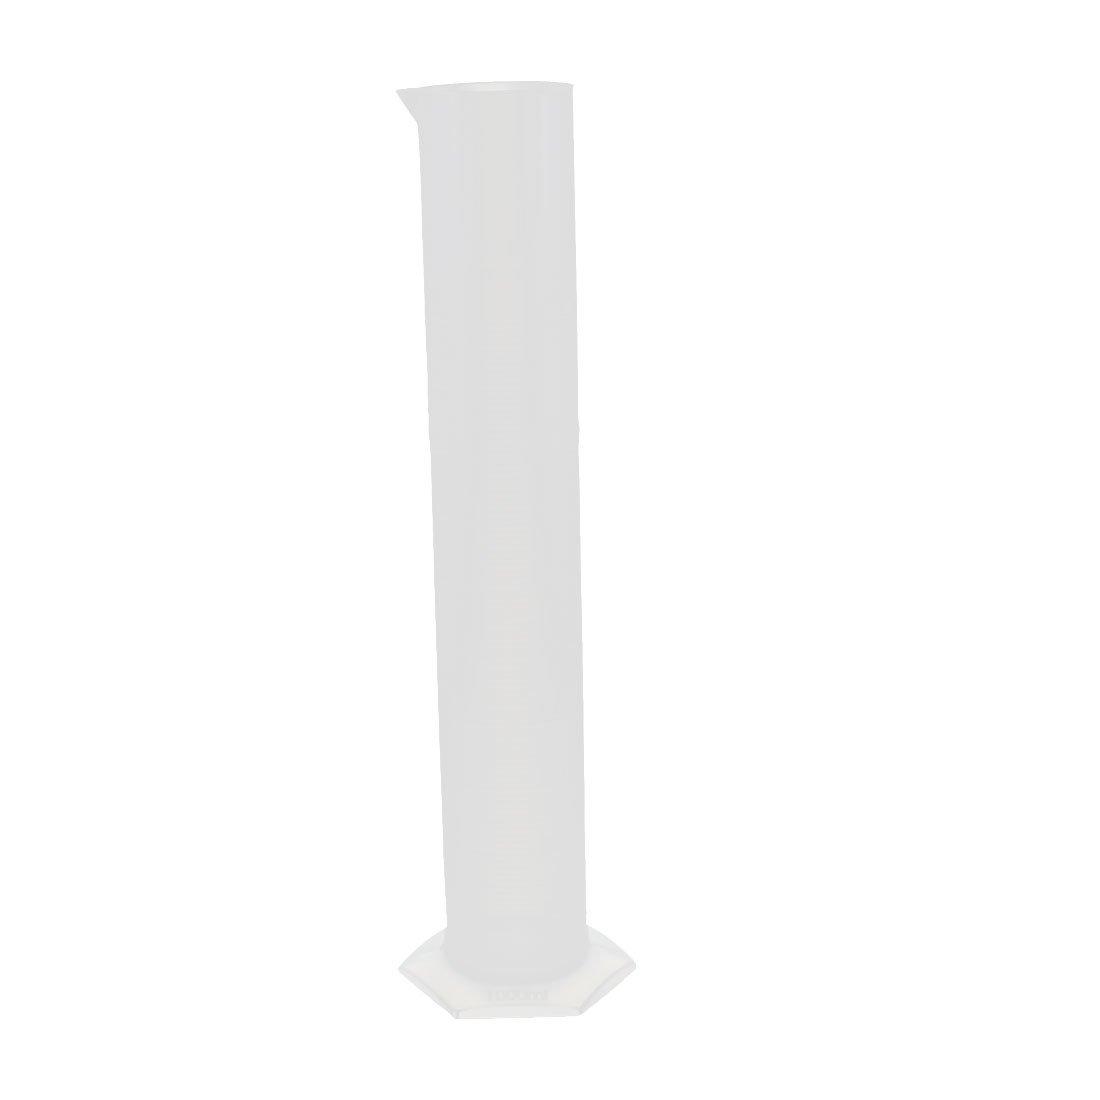 uxcell 1000mL Lab Hex Base Liquid Measurement Plastic Graduated Measuring Cylinder